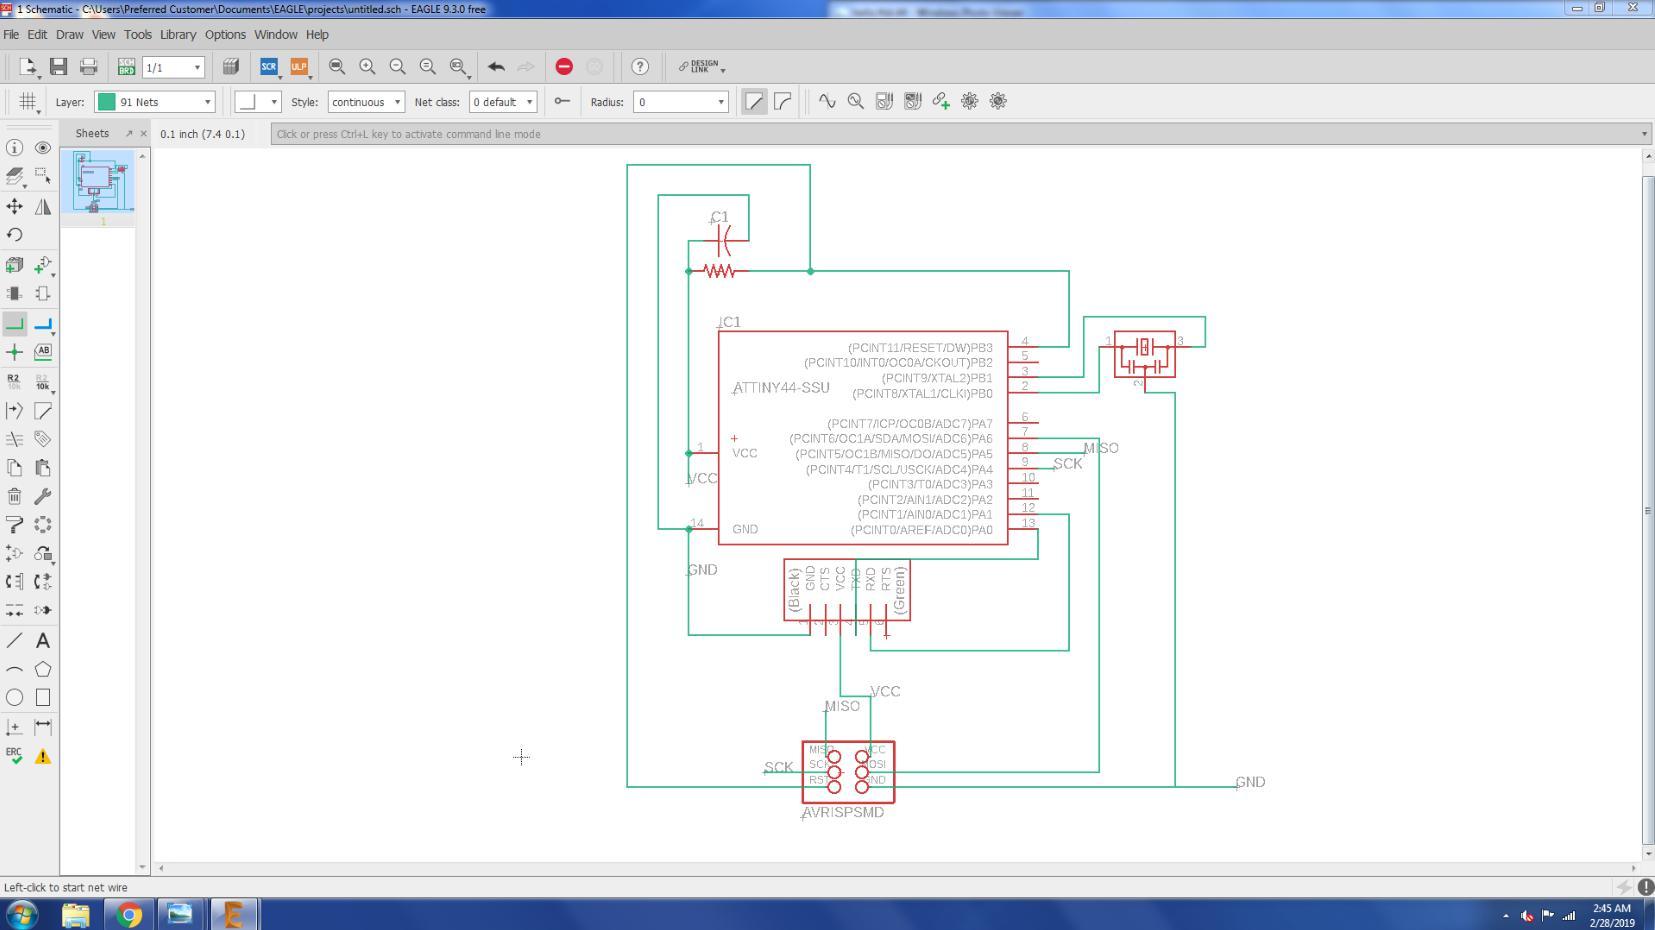 Ohmmeter Block Diagram Free Download Wiring Diagram Schematic